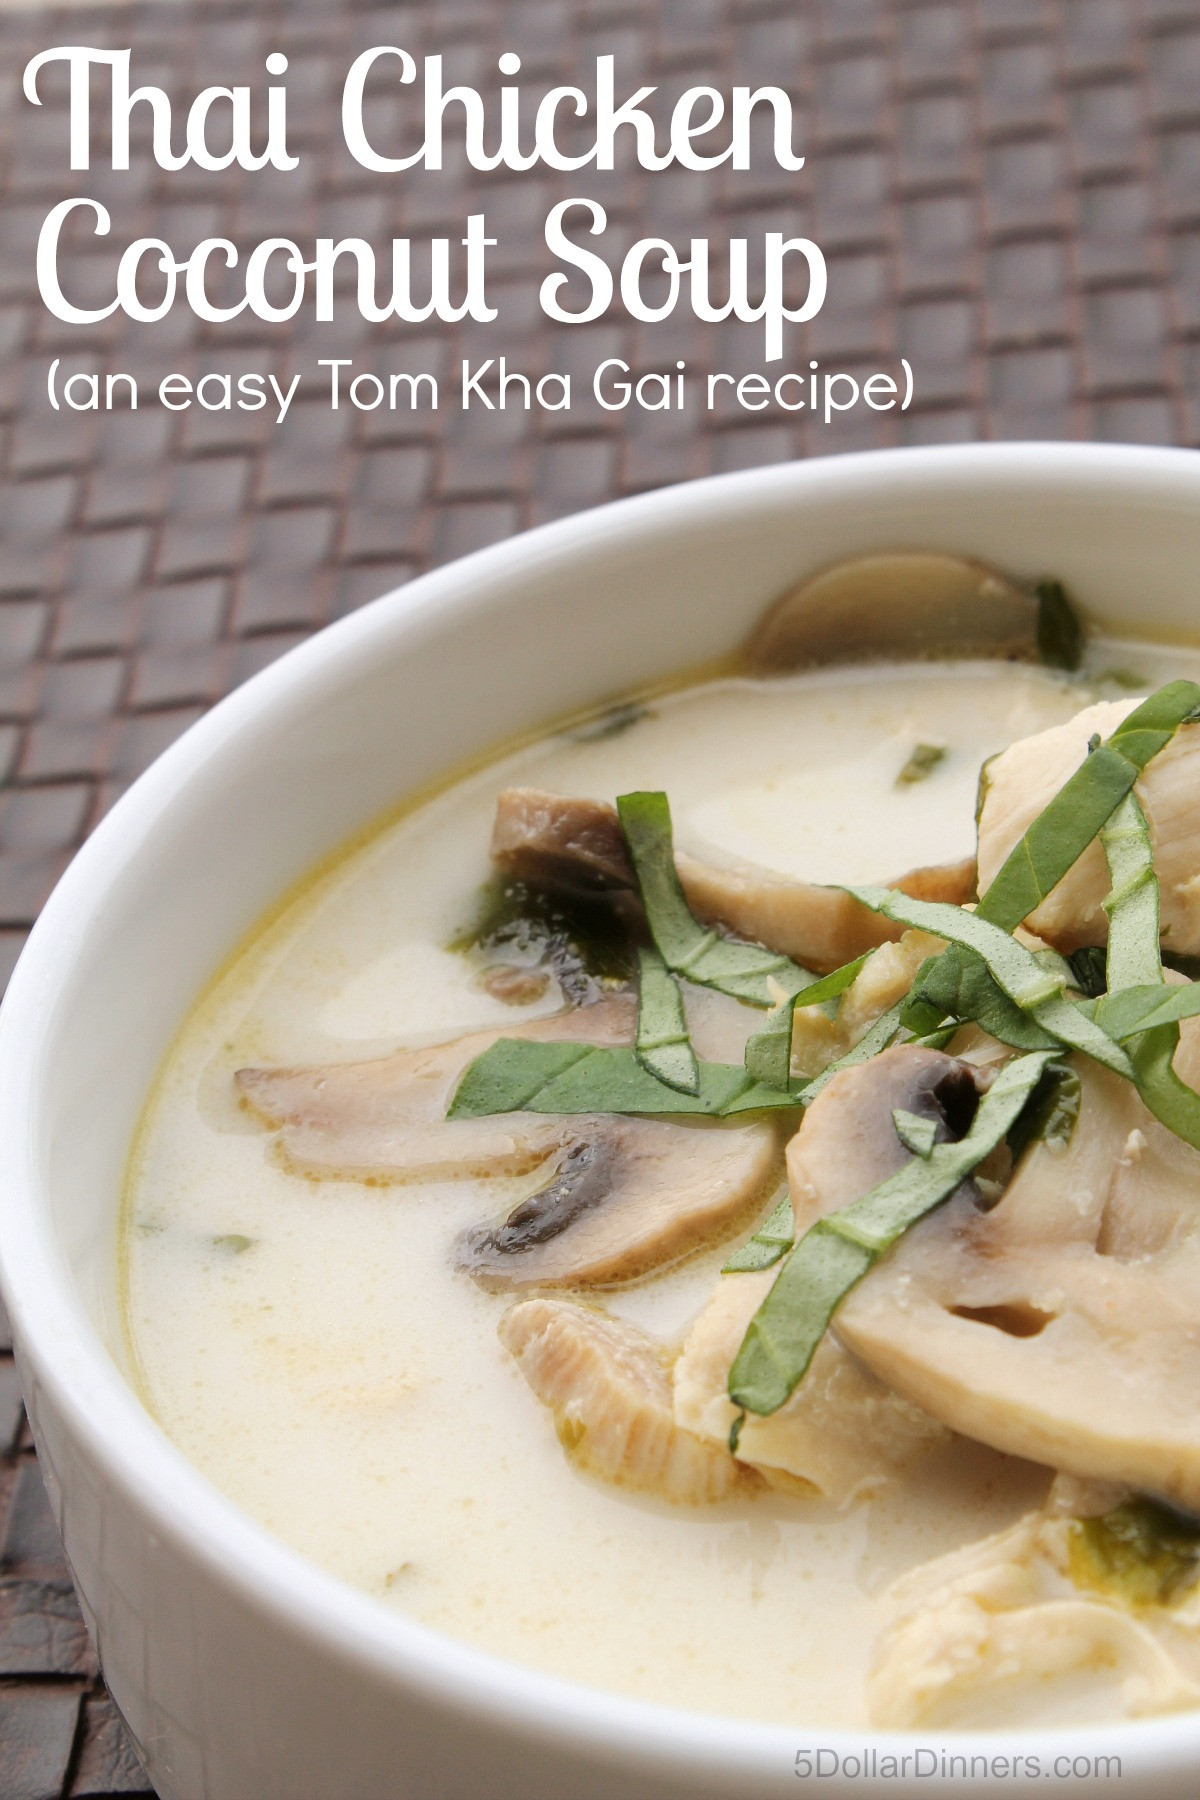 Thai Coconut Soup Recipes  Thai Chicken Coconut Soup Easy Tom Kha Gai